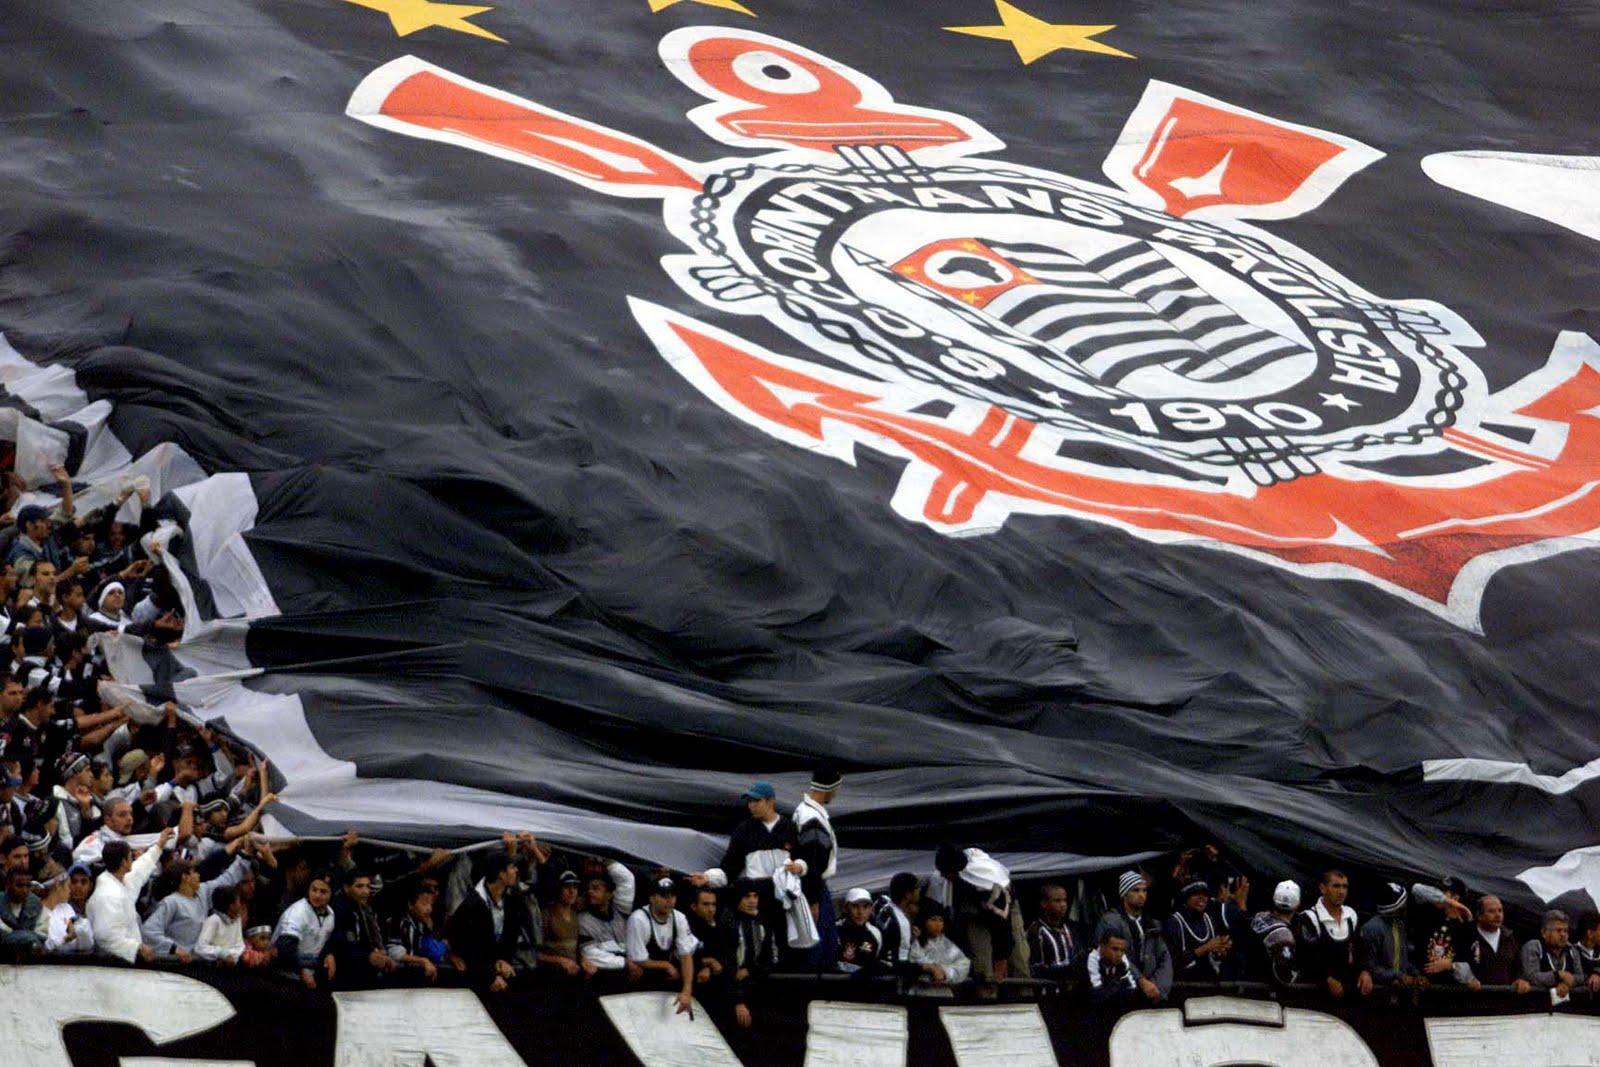 Baixar Imagem: Corinthians